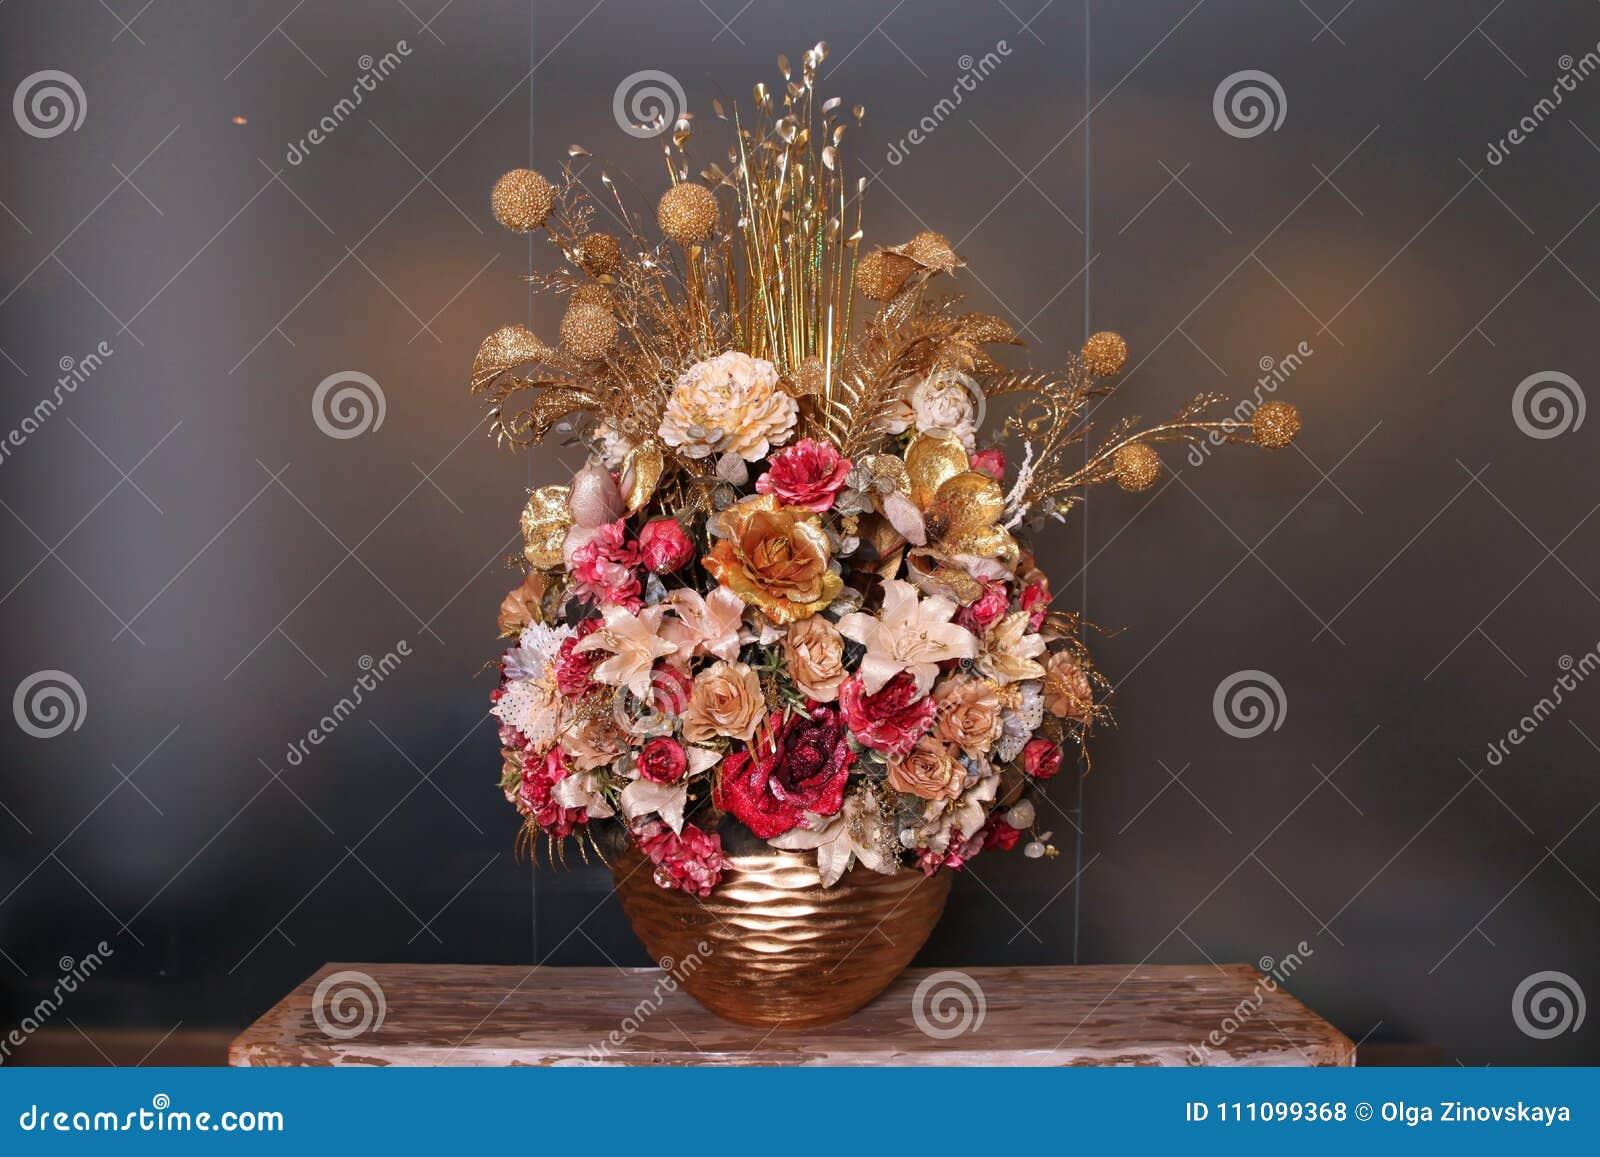 Artificial flower arrangement gold color stock photo image of beautiful artificial flower arrangement gold color izmirmasajfo